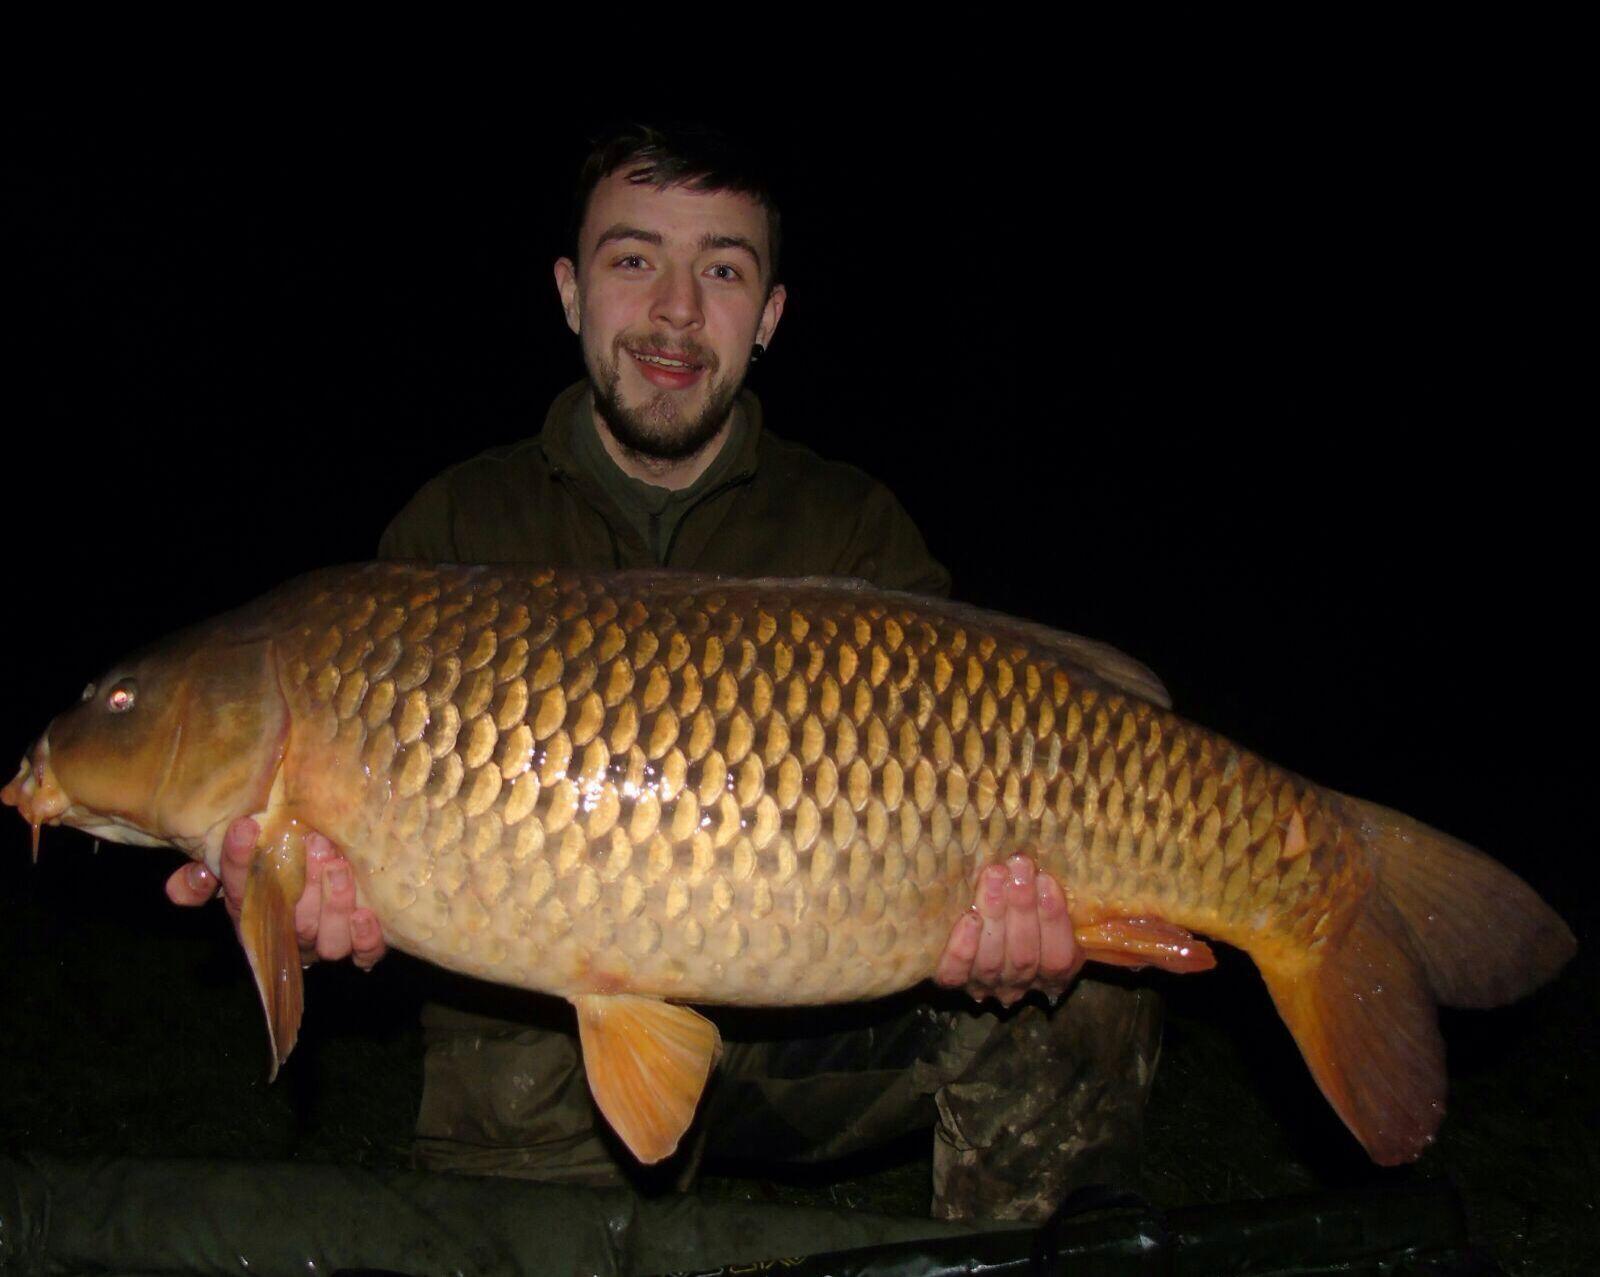 32lb-carp-Kyle-weaver-speci-lake-night-fishing-session-pleasure-fishing-Caught-on-semi-buoyant-boile-and-lead-